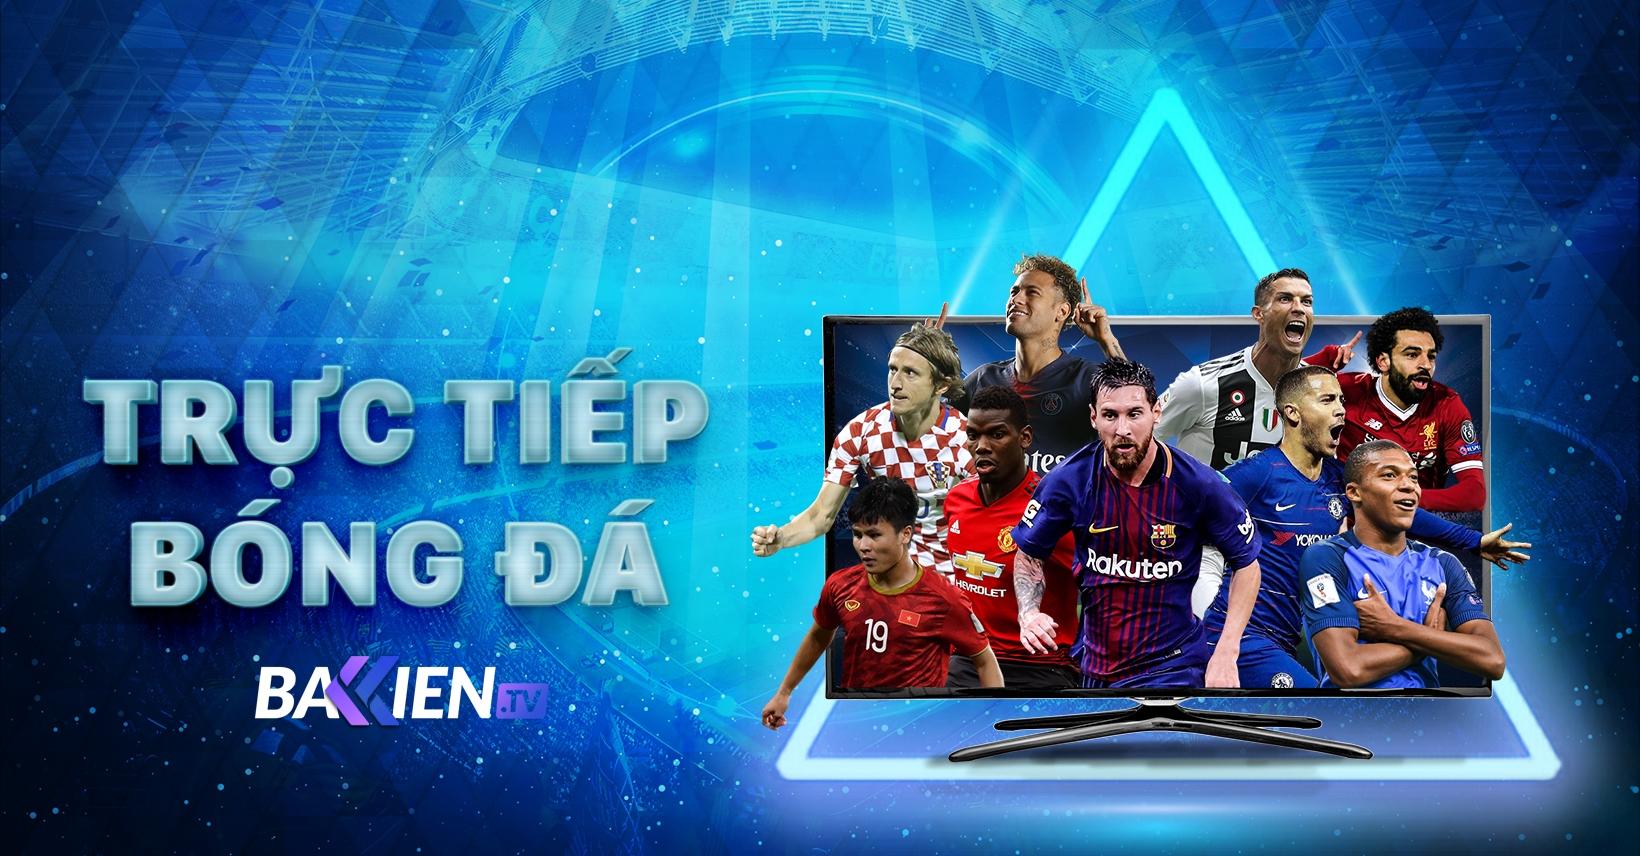 Ba Kien TV (@bakientv) Cover Image